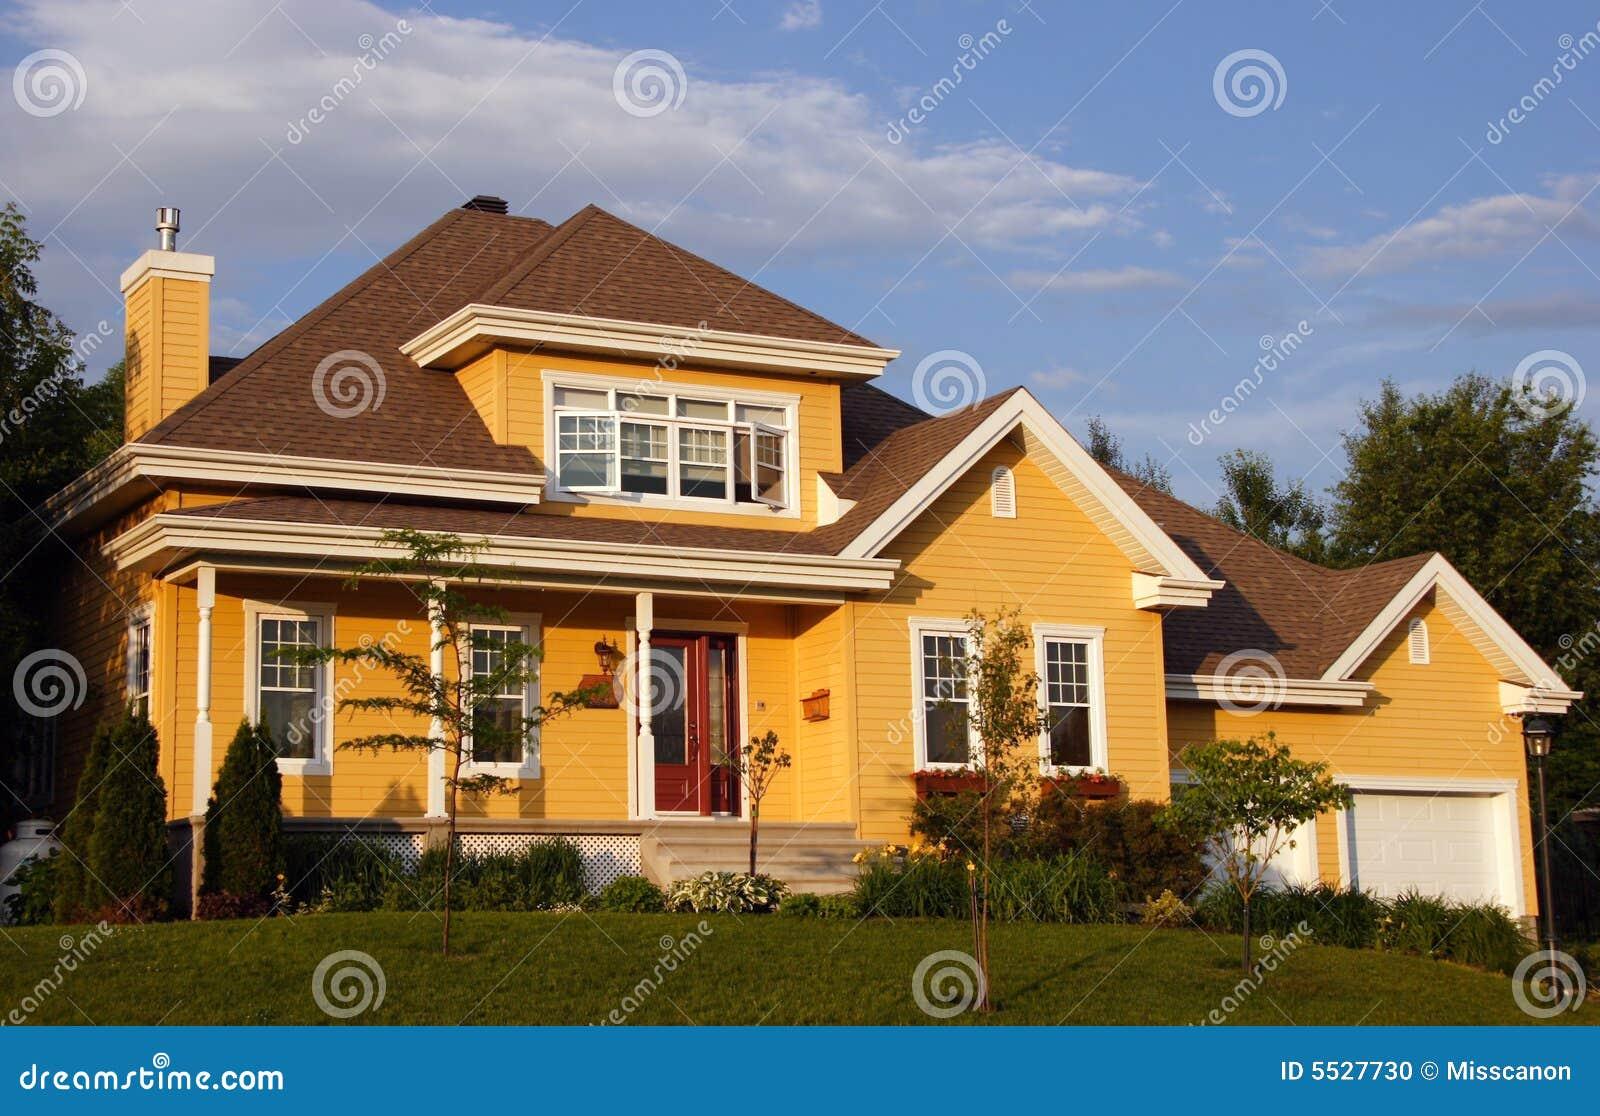 New Yellow House Stock Photo Image 5527730